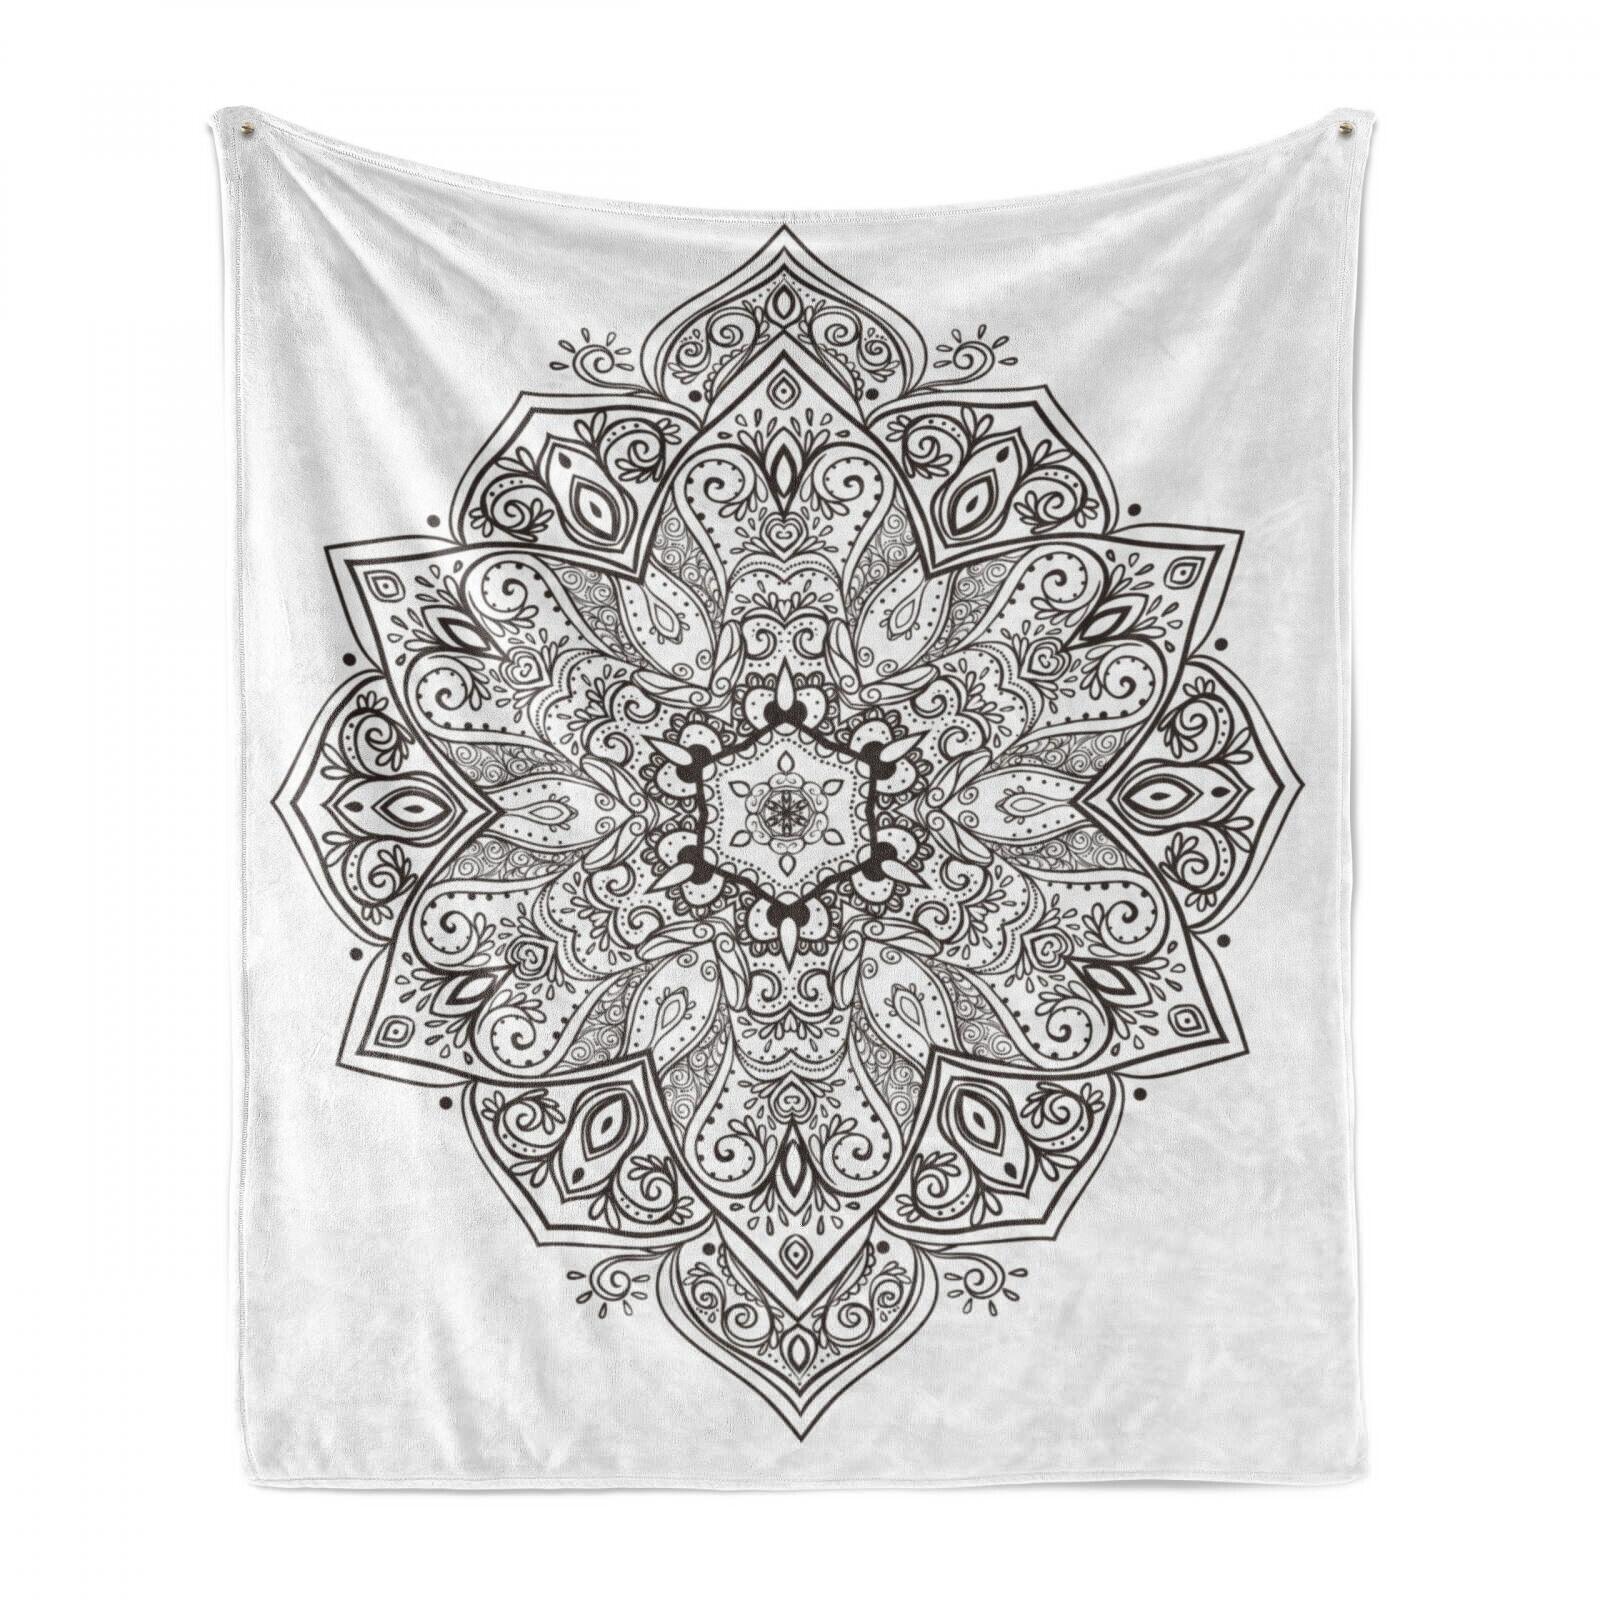 MANDALA Soft Flannel Fleece Blanket Eastern Psychedelic